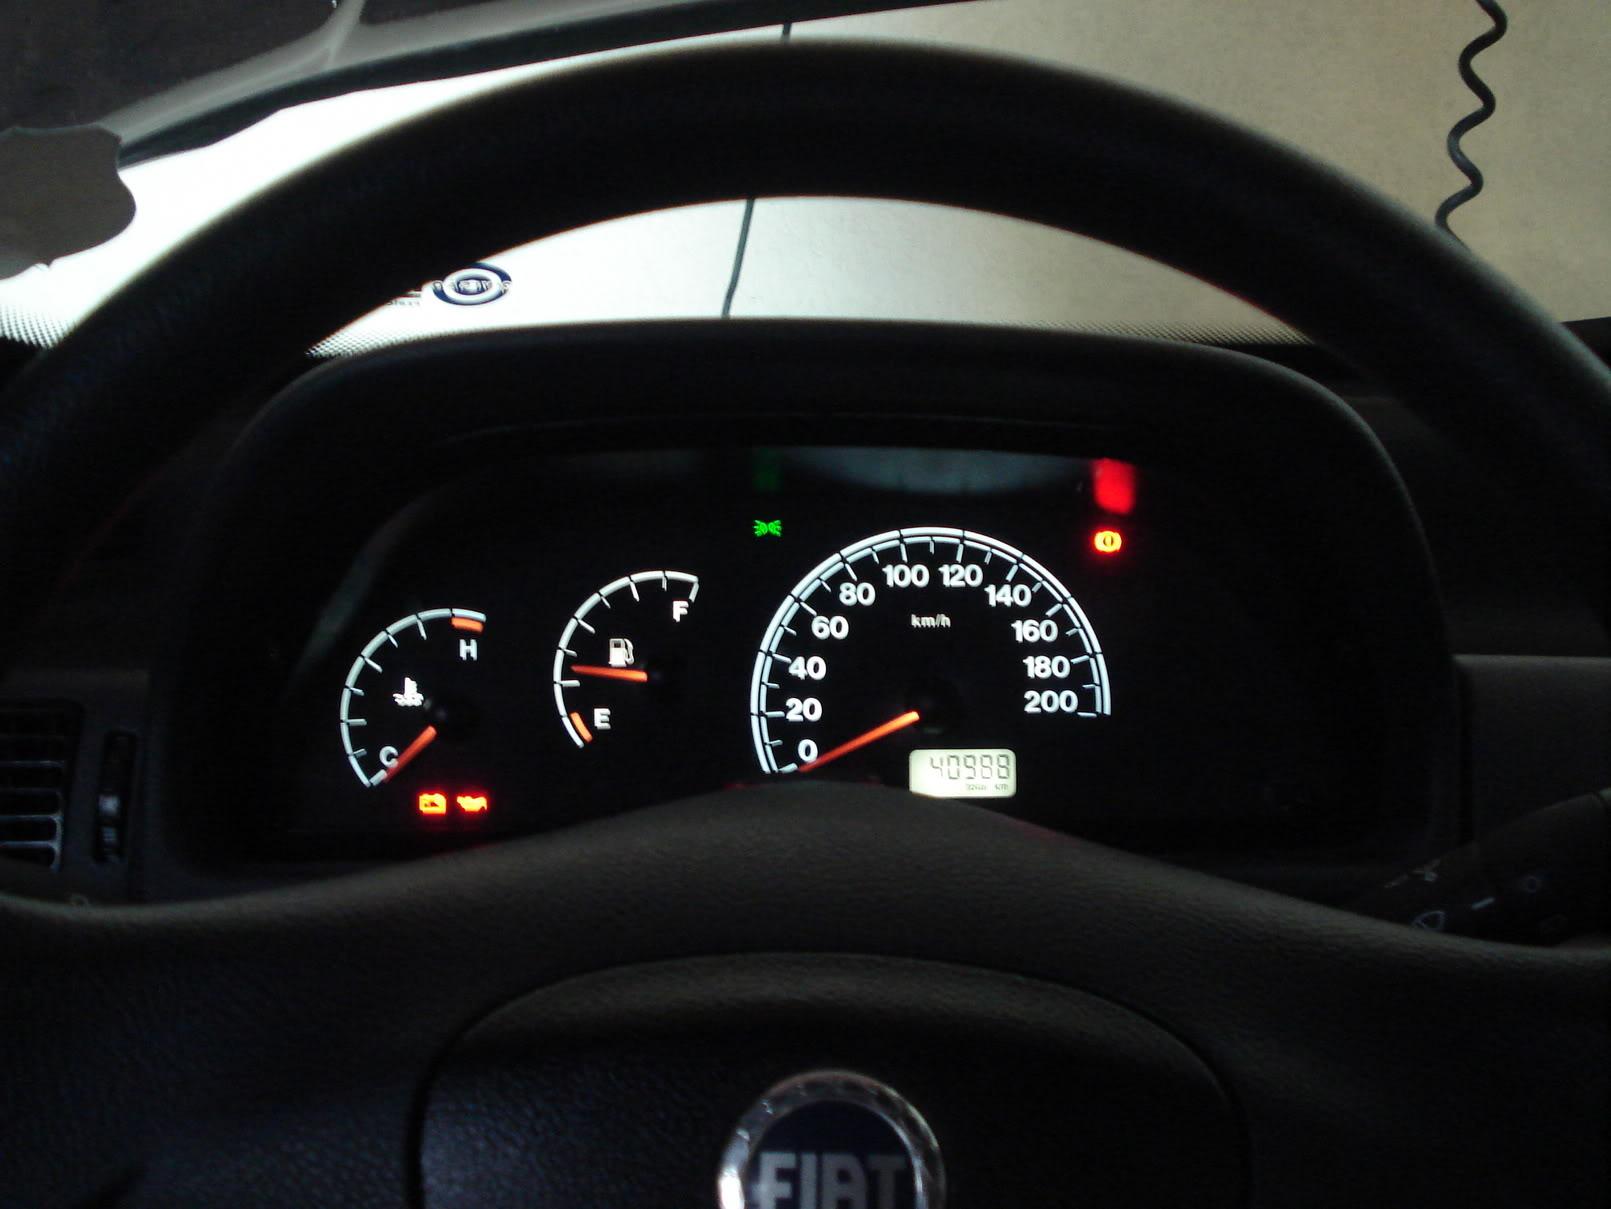 Uno fire ? 4p ? cinza  2002  S?o Paulo, Brasil  Venda de Carros